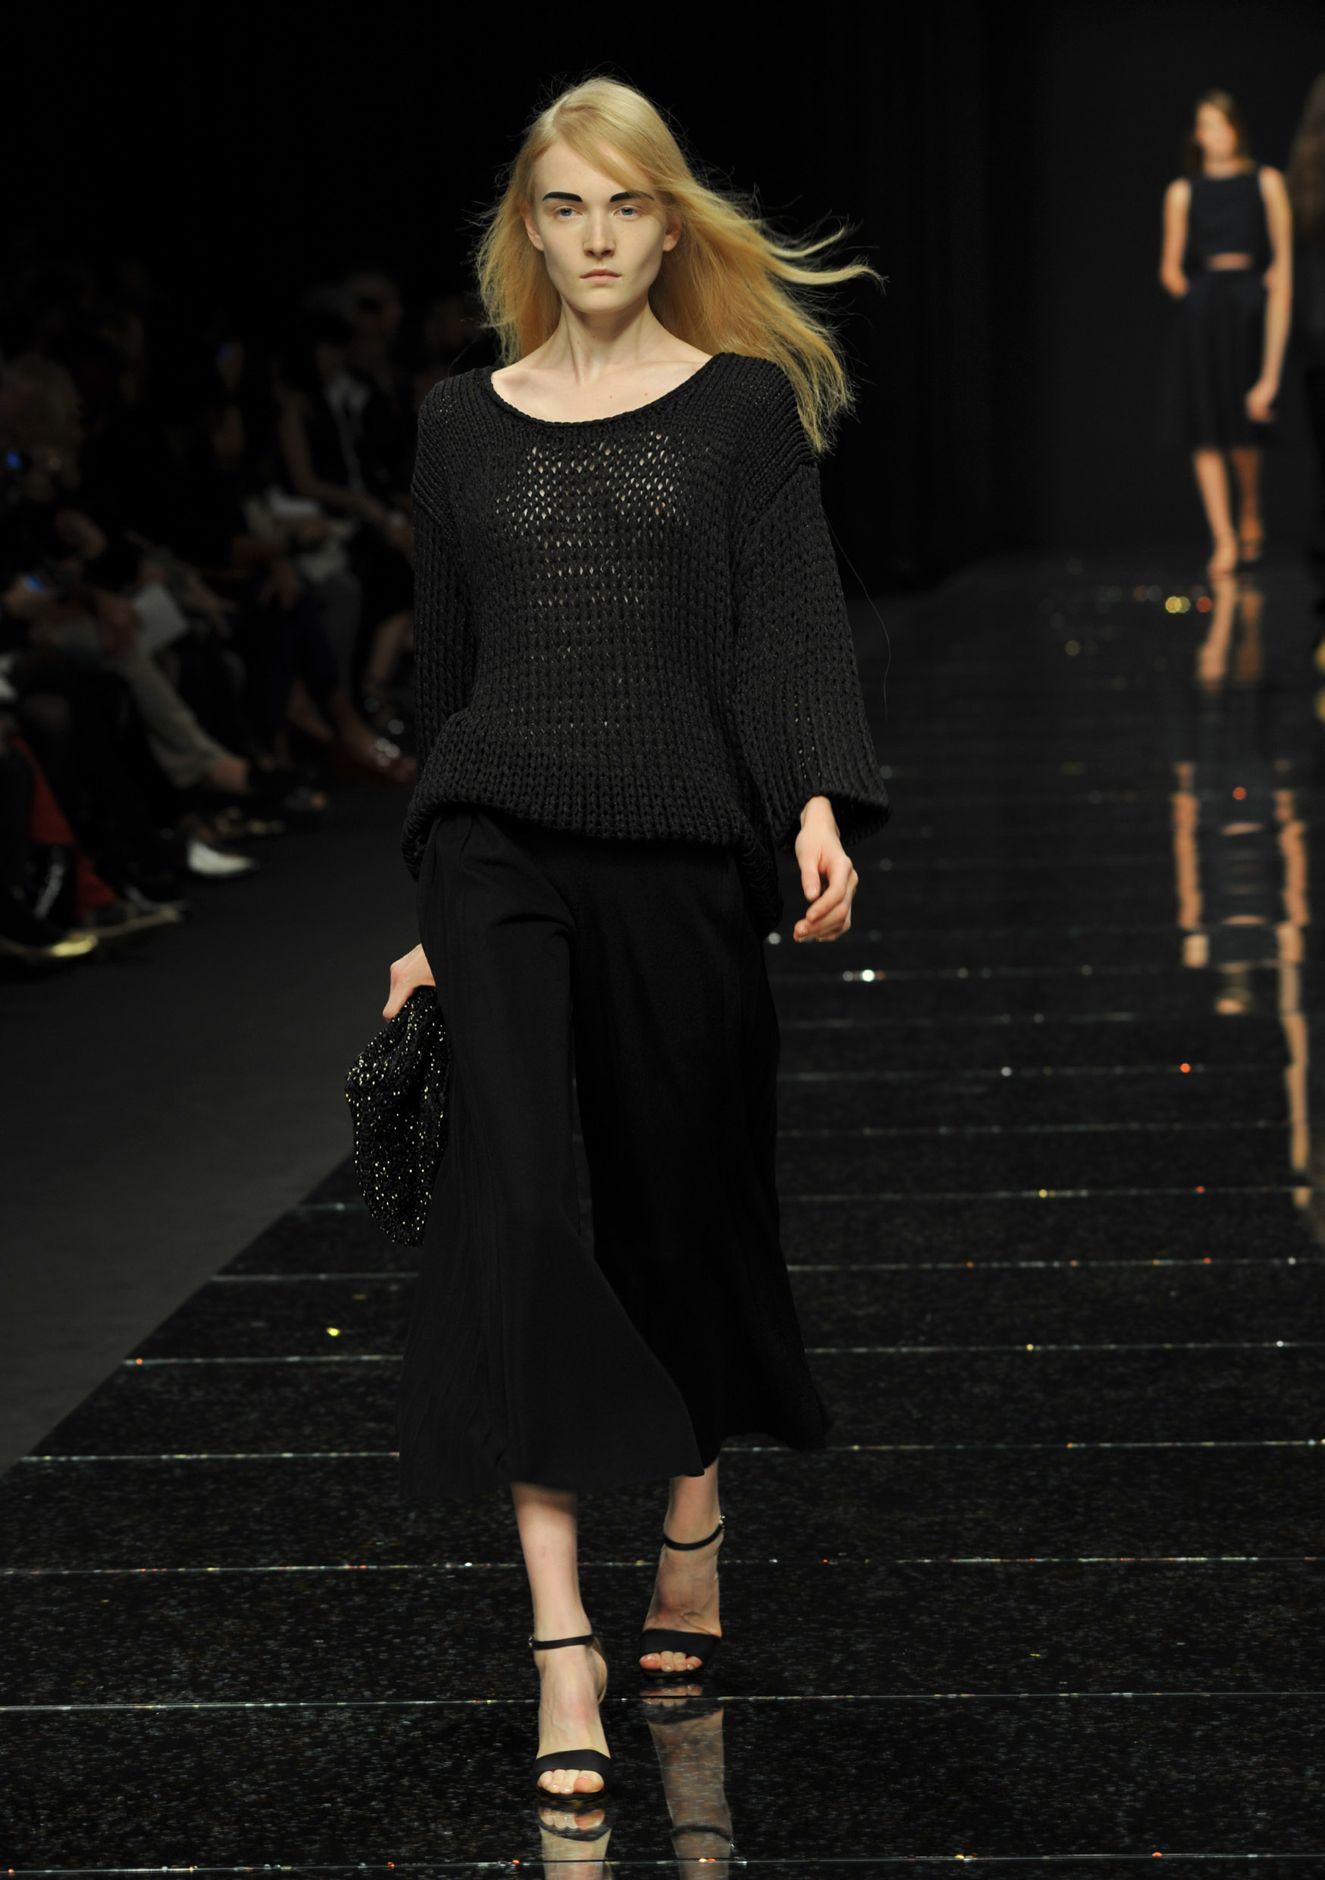 Anteprima Spring Summer 2013 Women Collection Milano Fashion Week Fashion Show